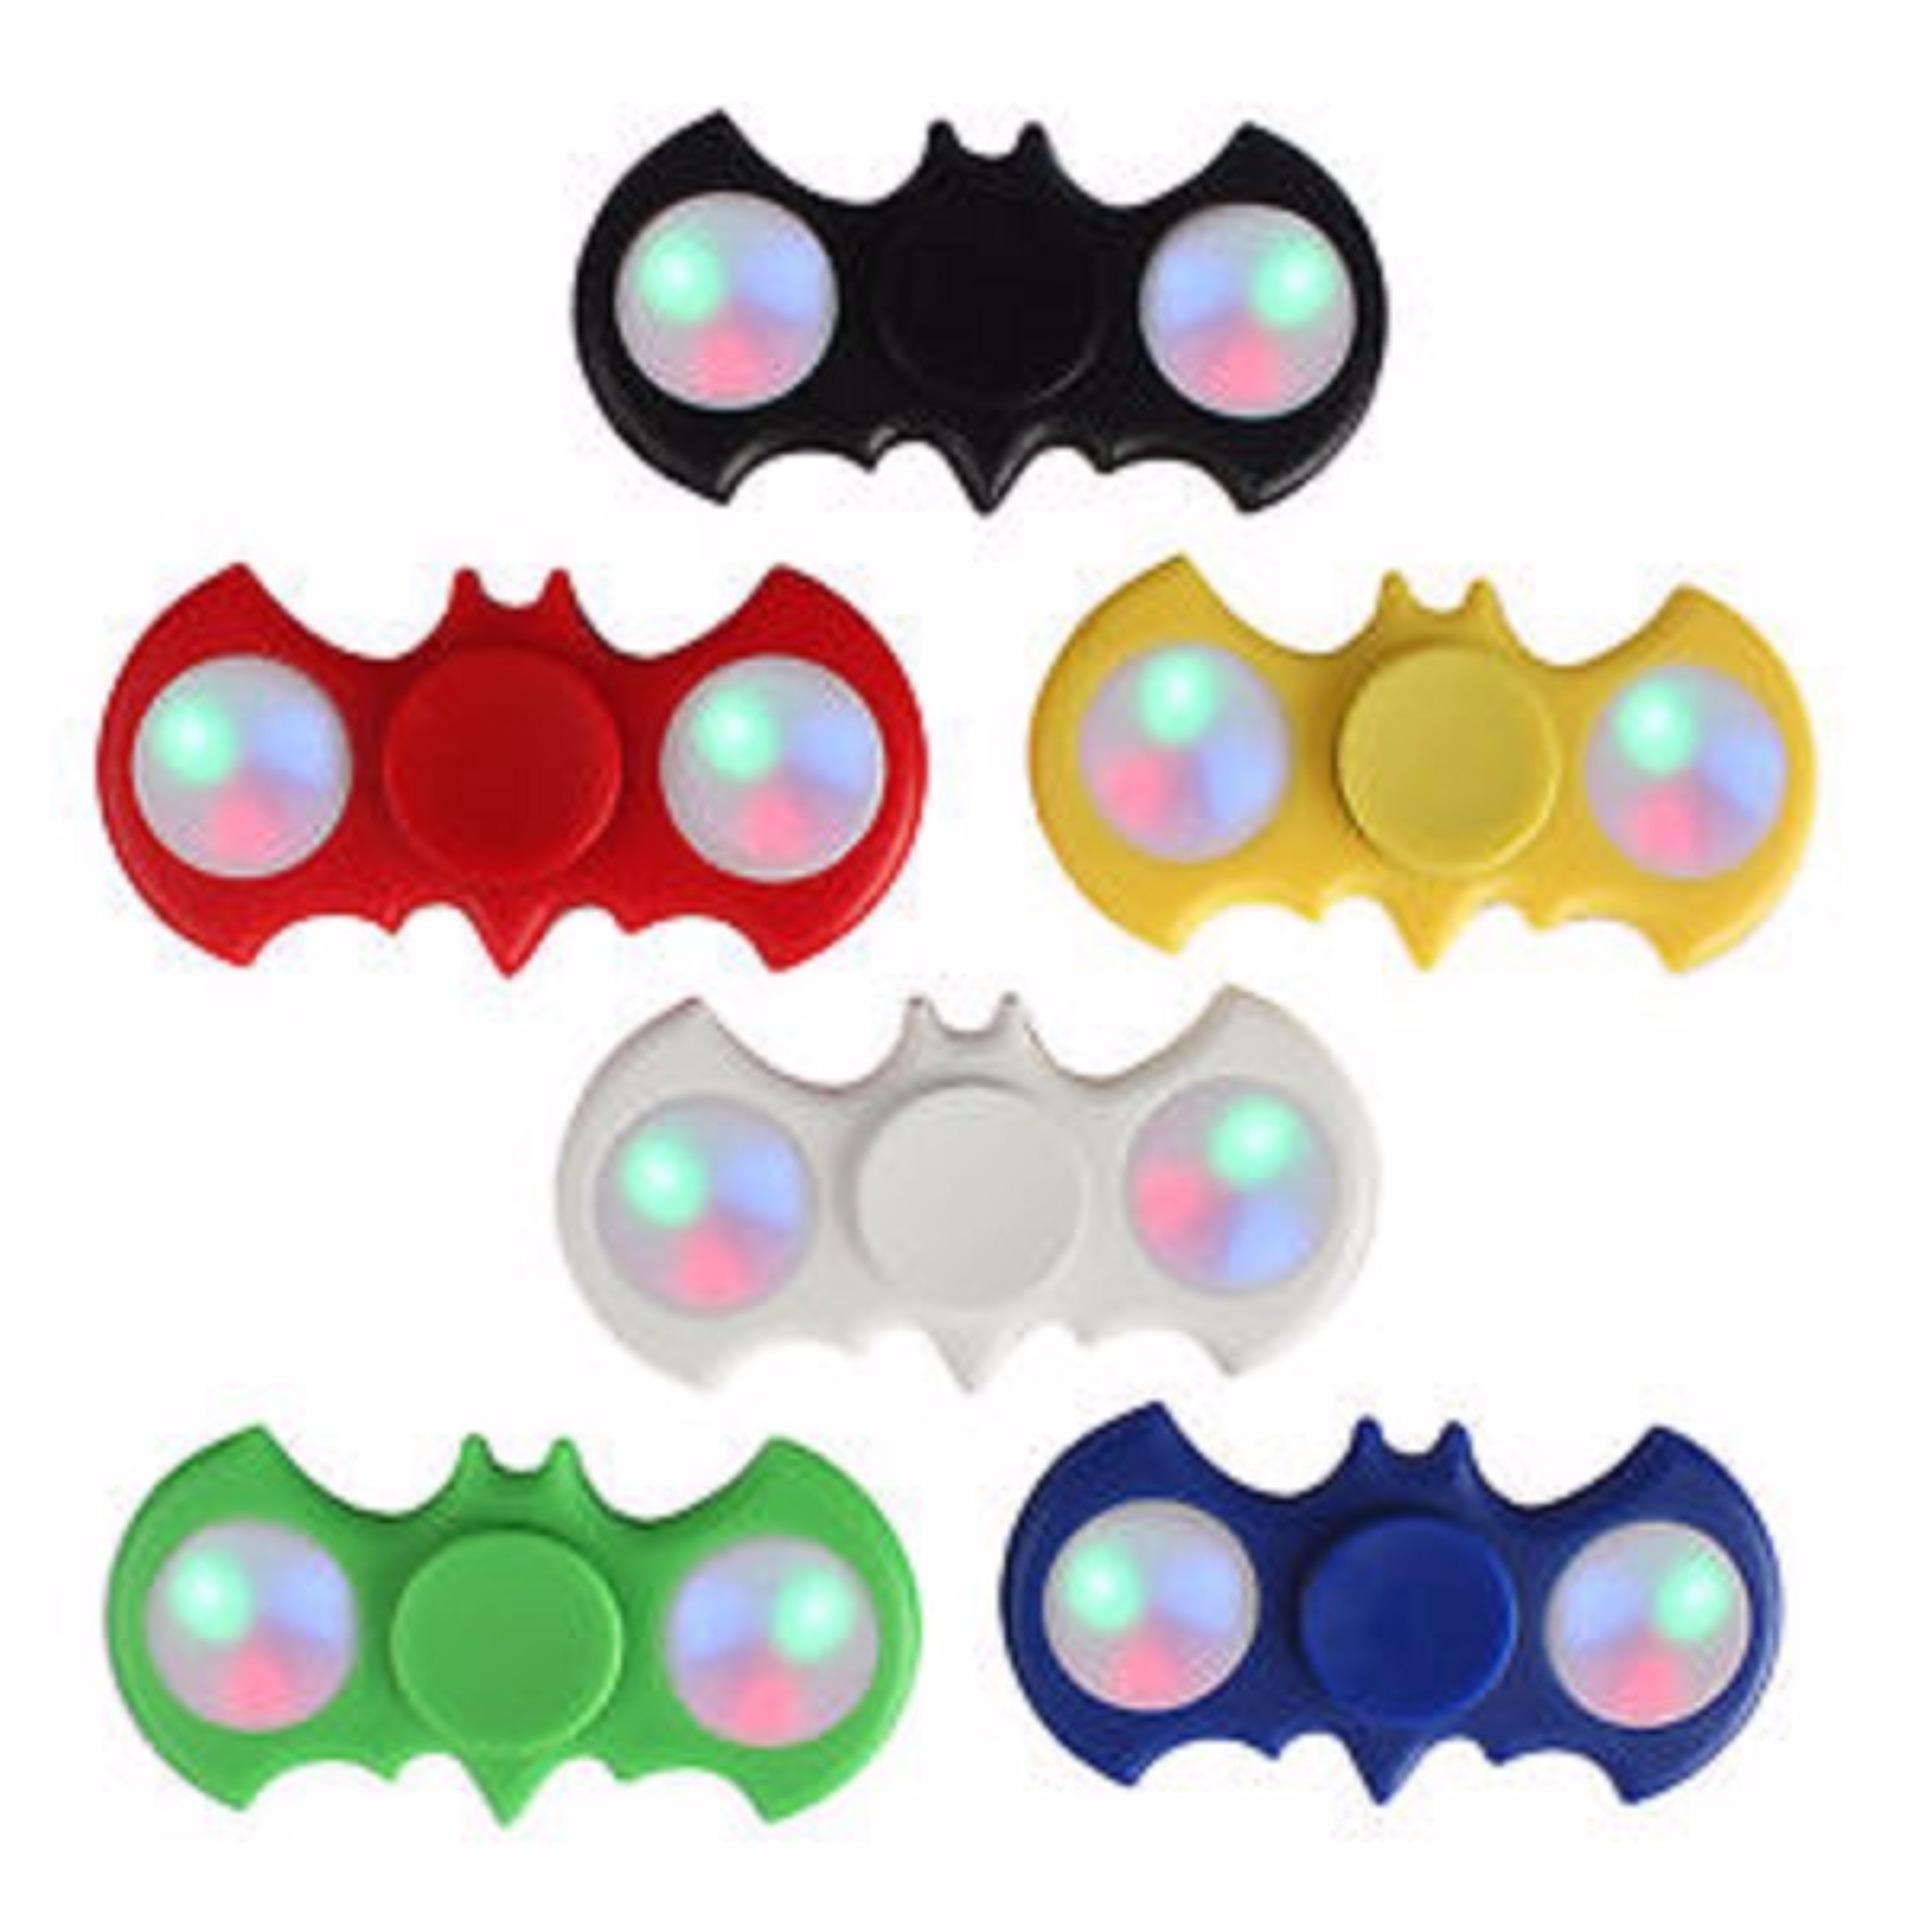 Fidget Spinner Batman With LED Hand Toys Focus Games / MainanSpinner Tangan Model Batman Penghilang Kebiasan